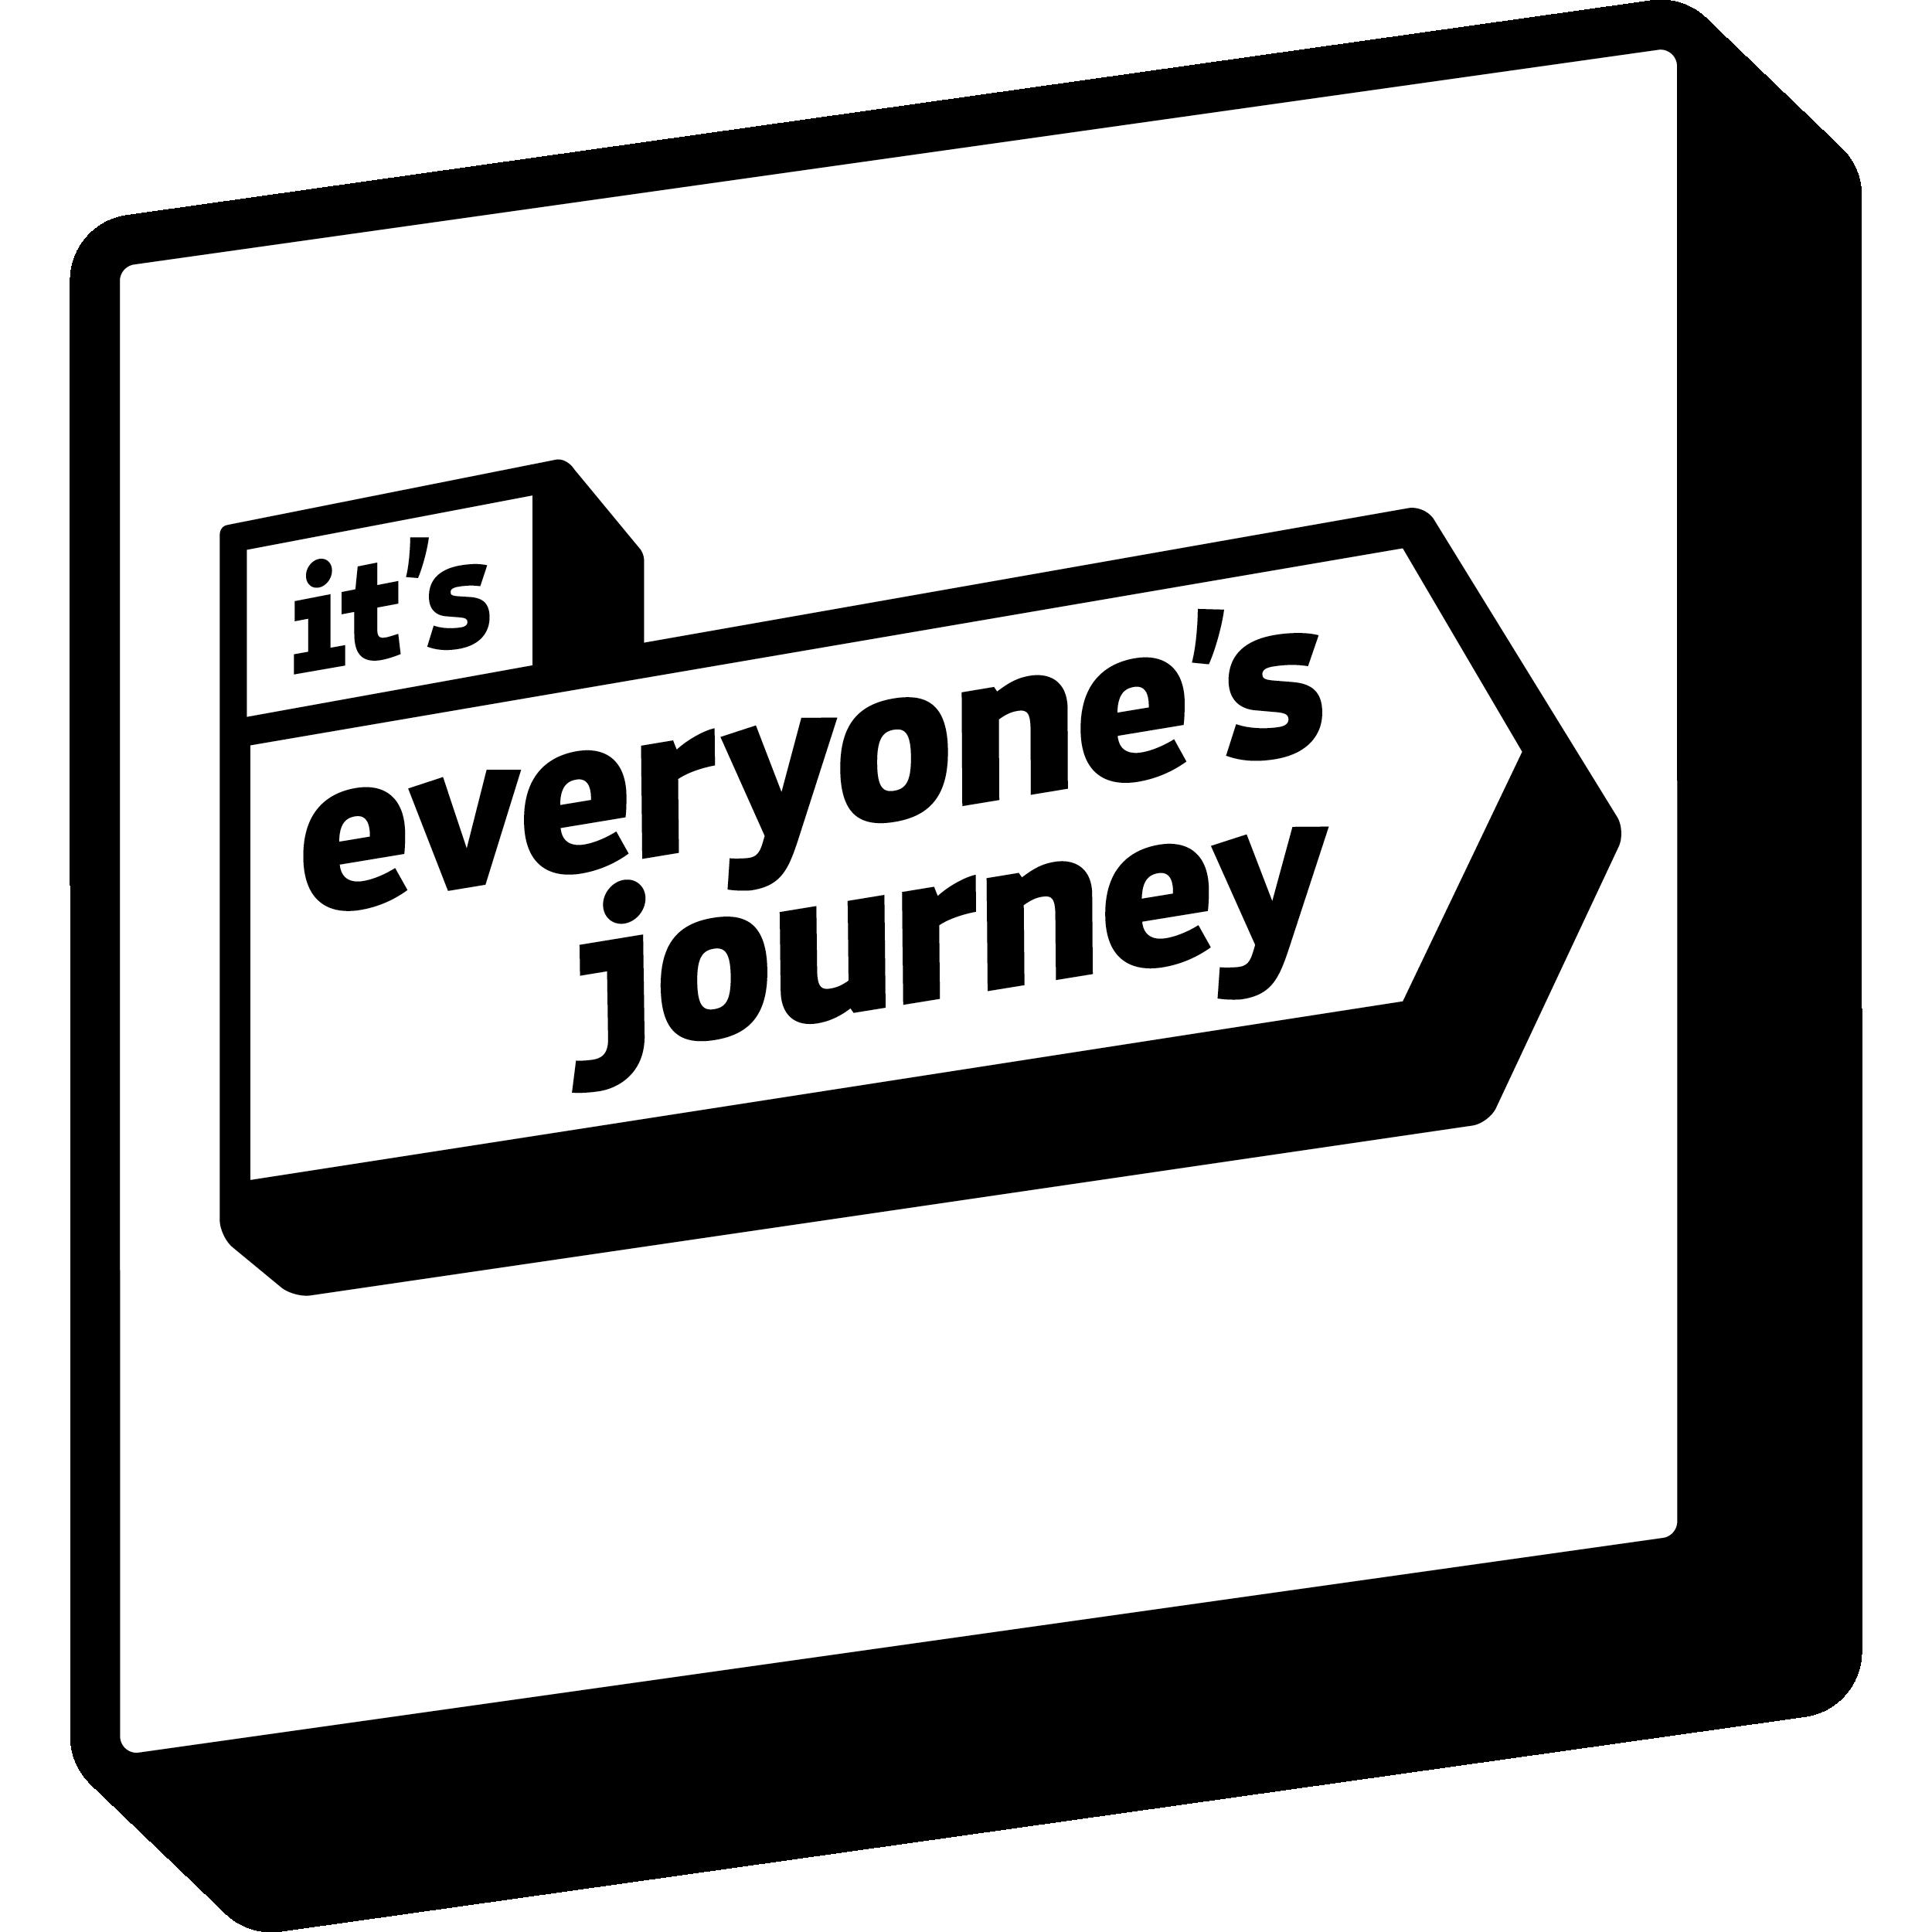 it's everyone's journey logo